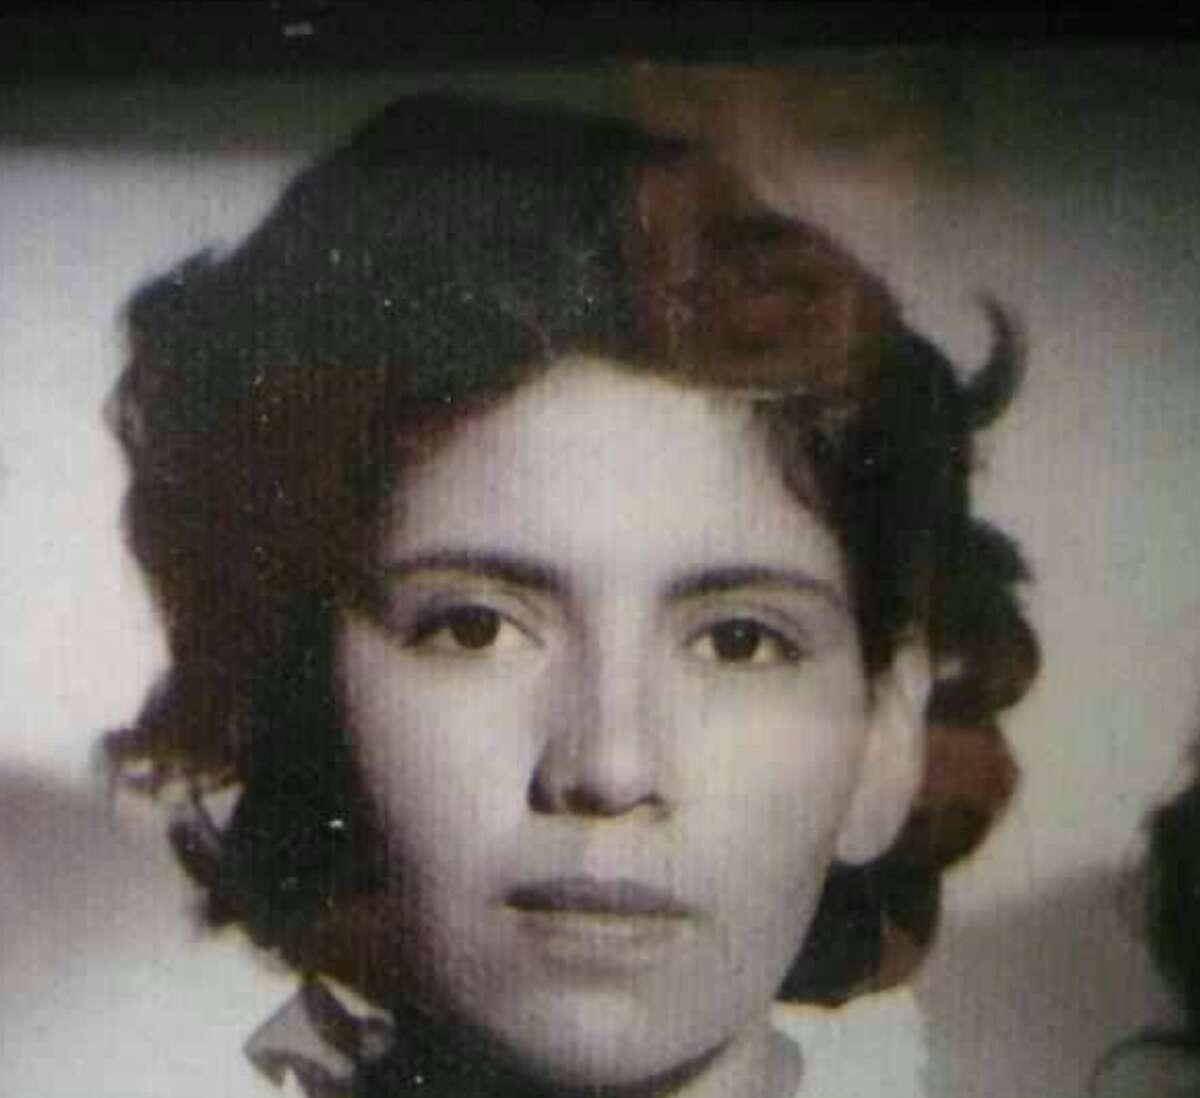 Julia Morales